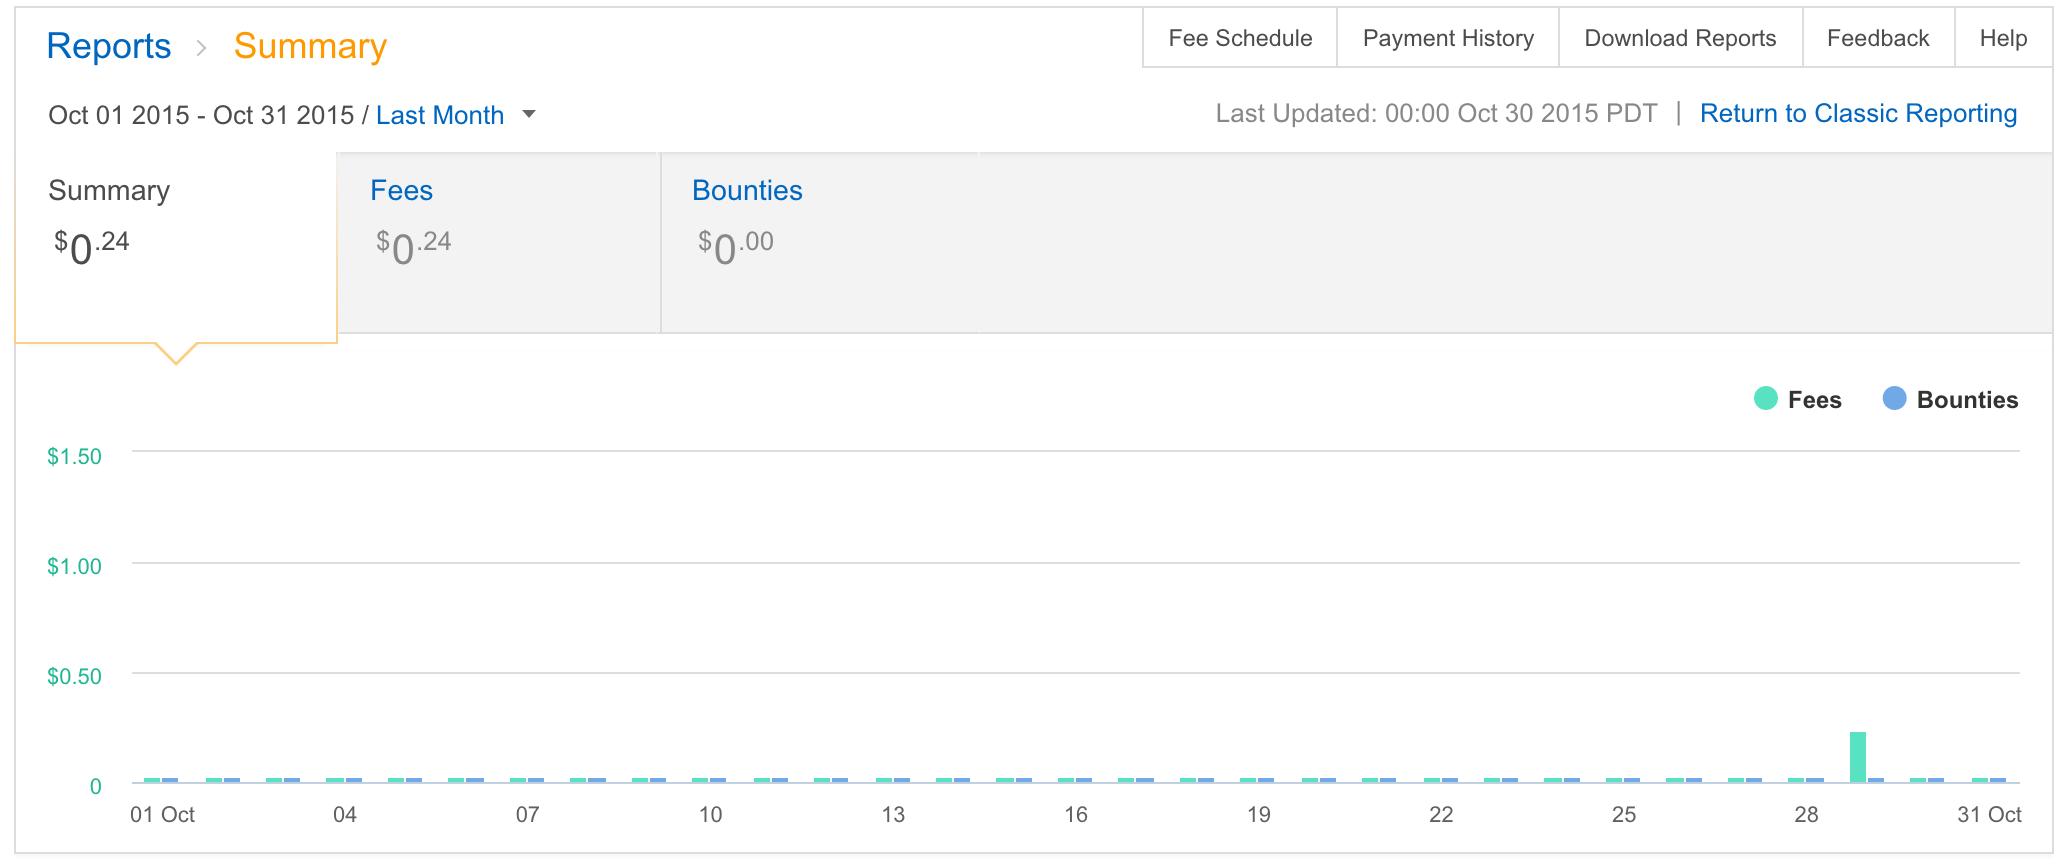 Amazon Stats Jack Murphy LIve October 2015